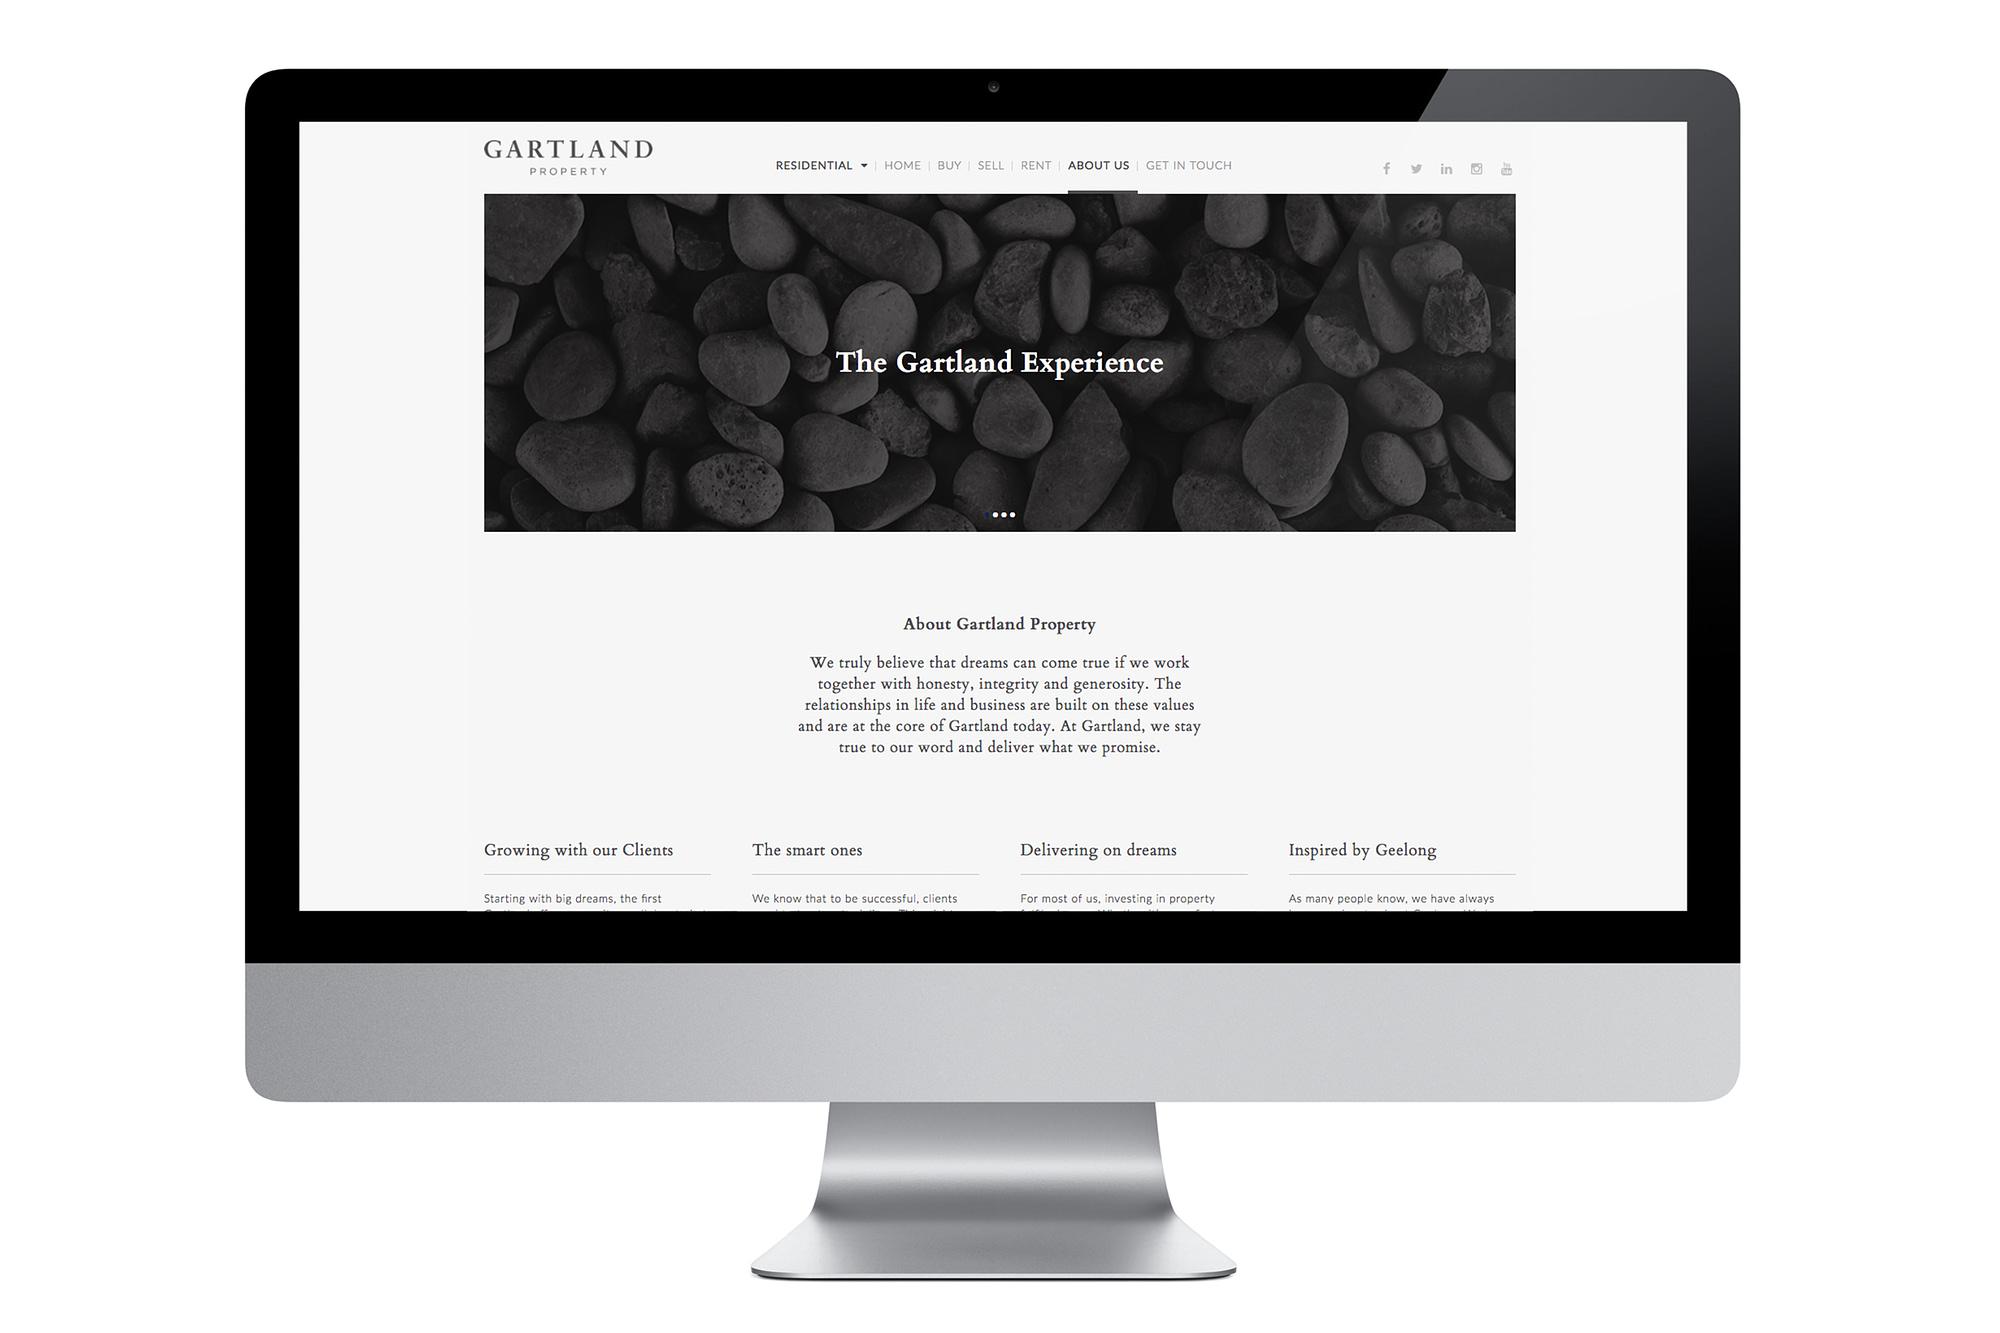 Gartland website About page